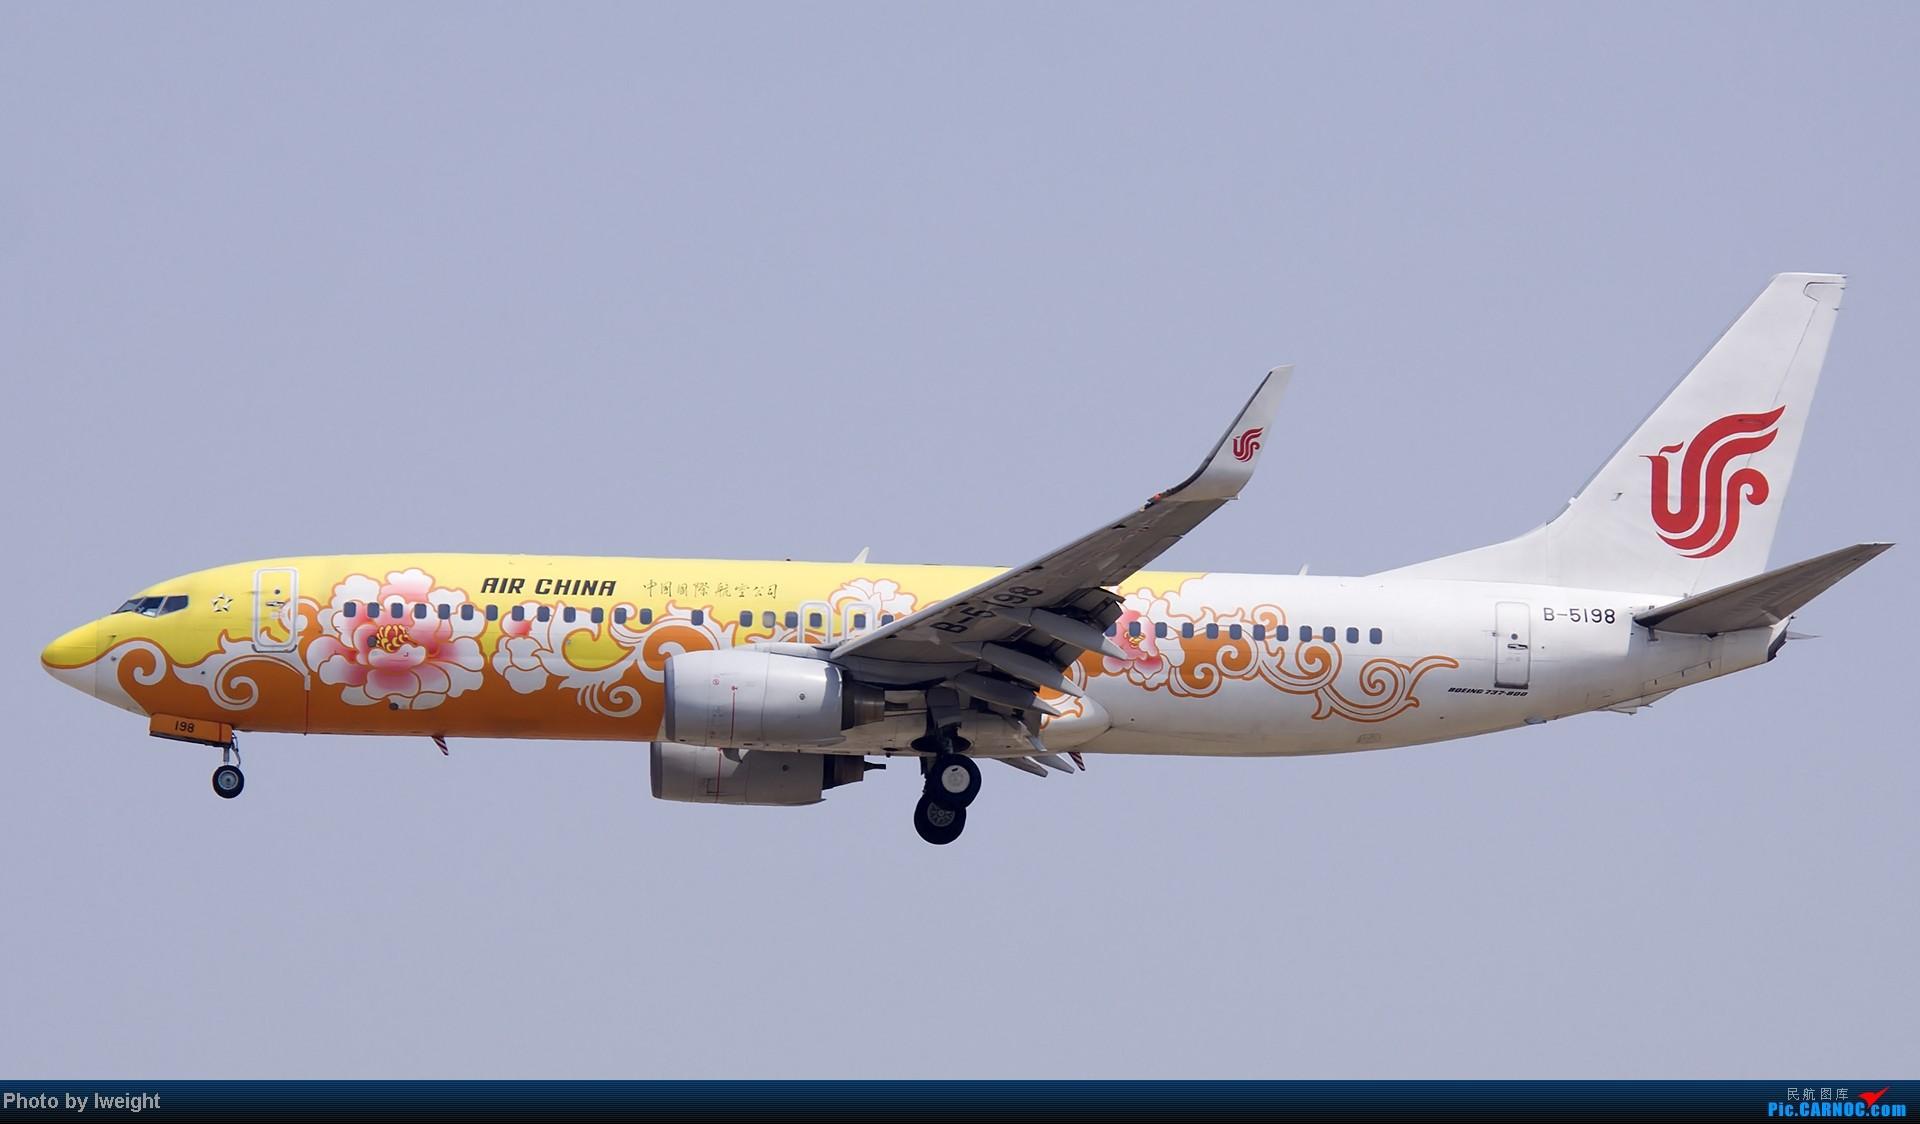 Re:[原创]错过了卡航的巴塞罗那号,只有这些大路货了,泪奔啊 BOEING 737-800 B-5198 中国北京首都机场